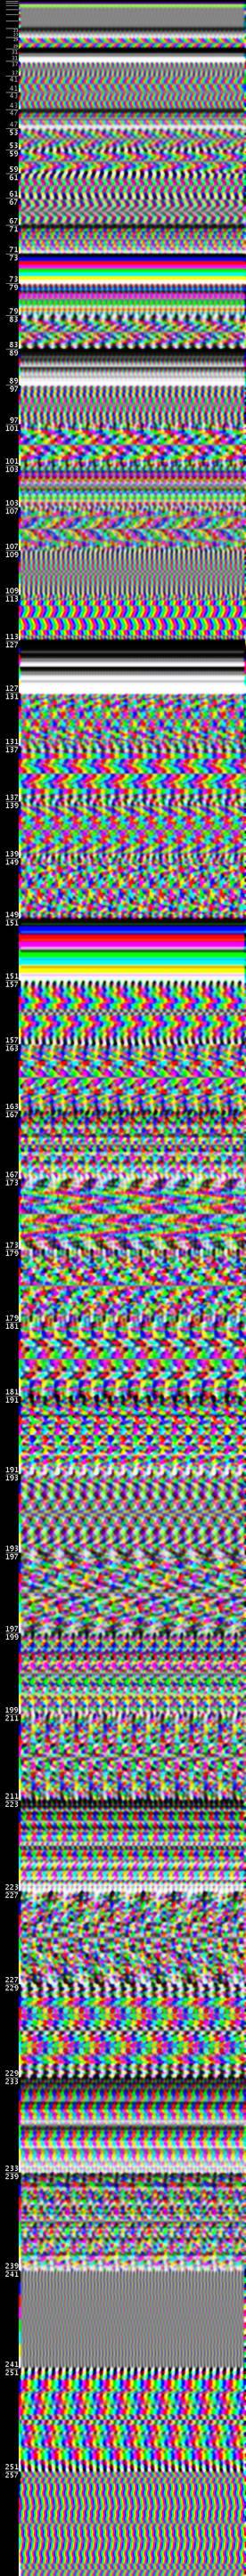 Prime Fraction Run for Base 8 (Enhanced Colour)